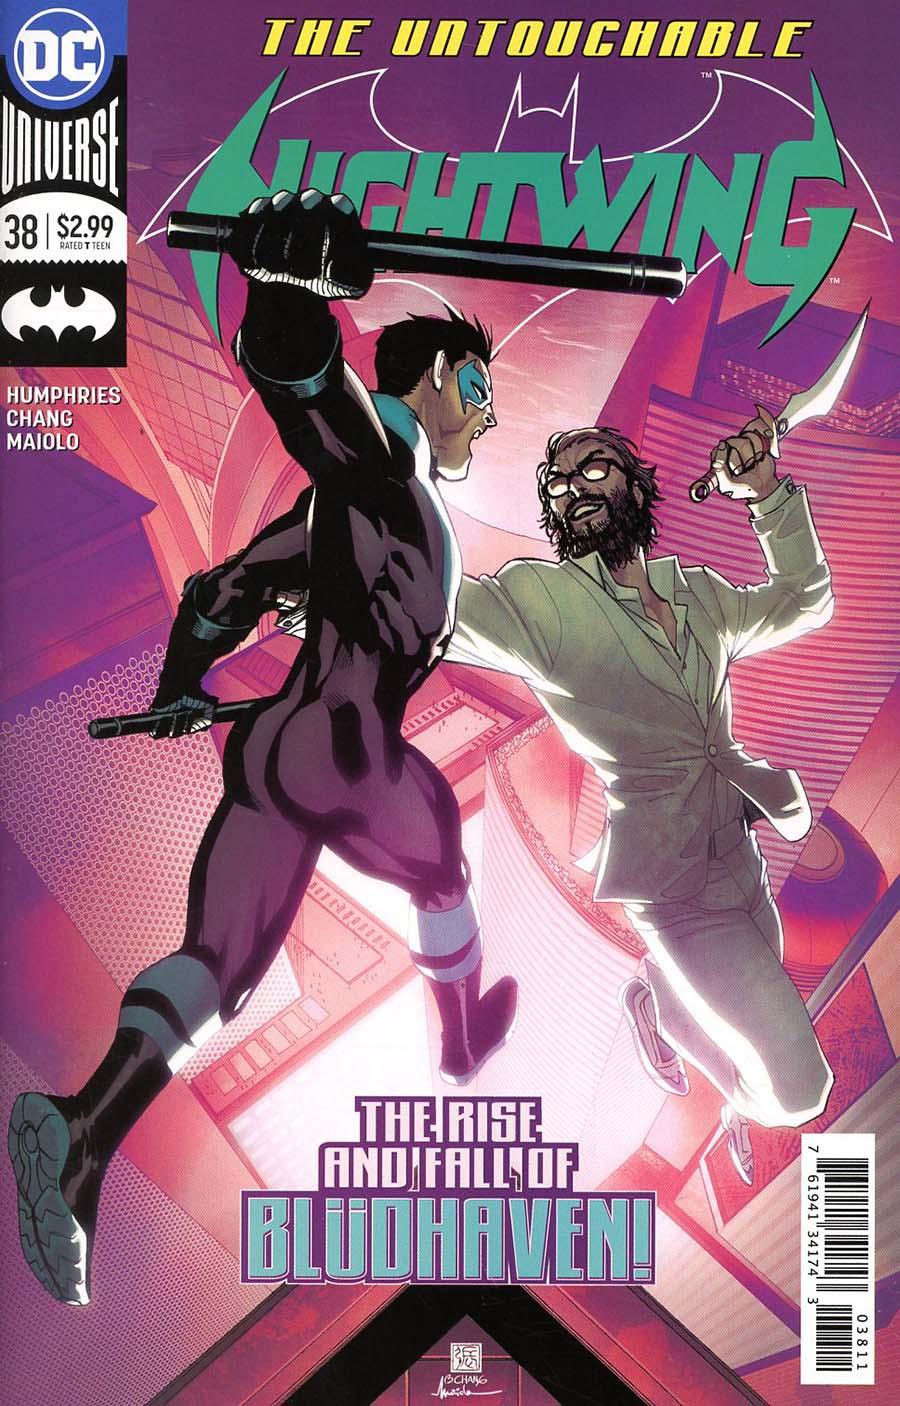 Nightwing Vol 4 #38 Cover A Regular Bernard Chang Cover